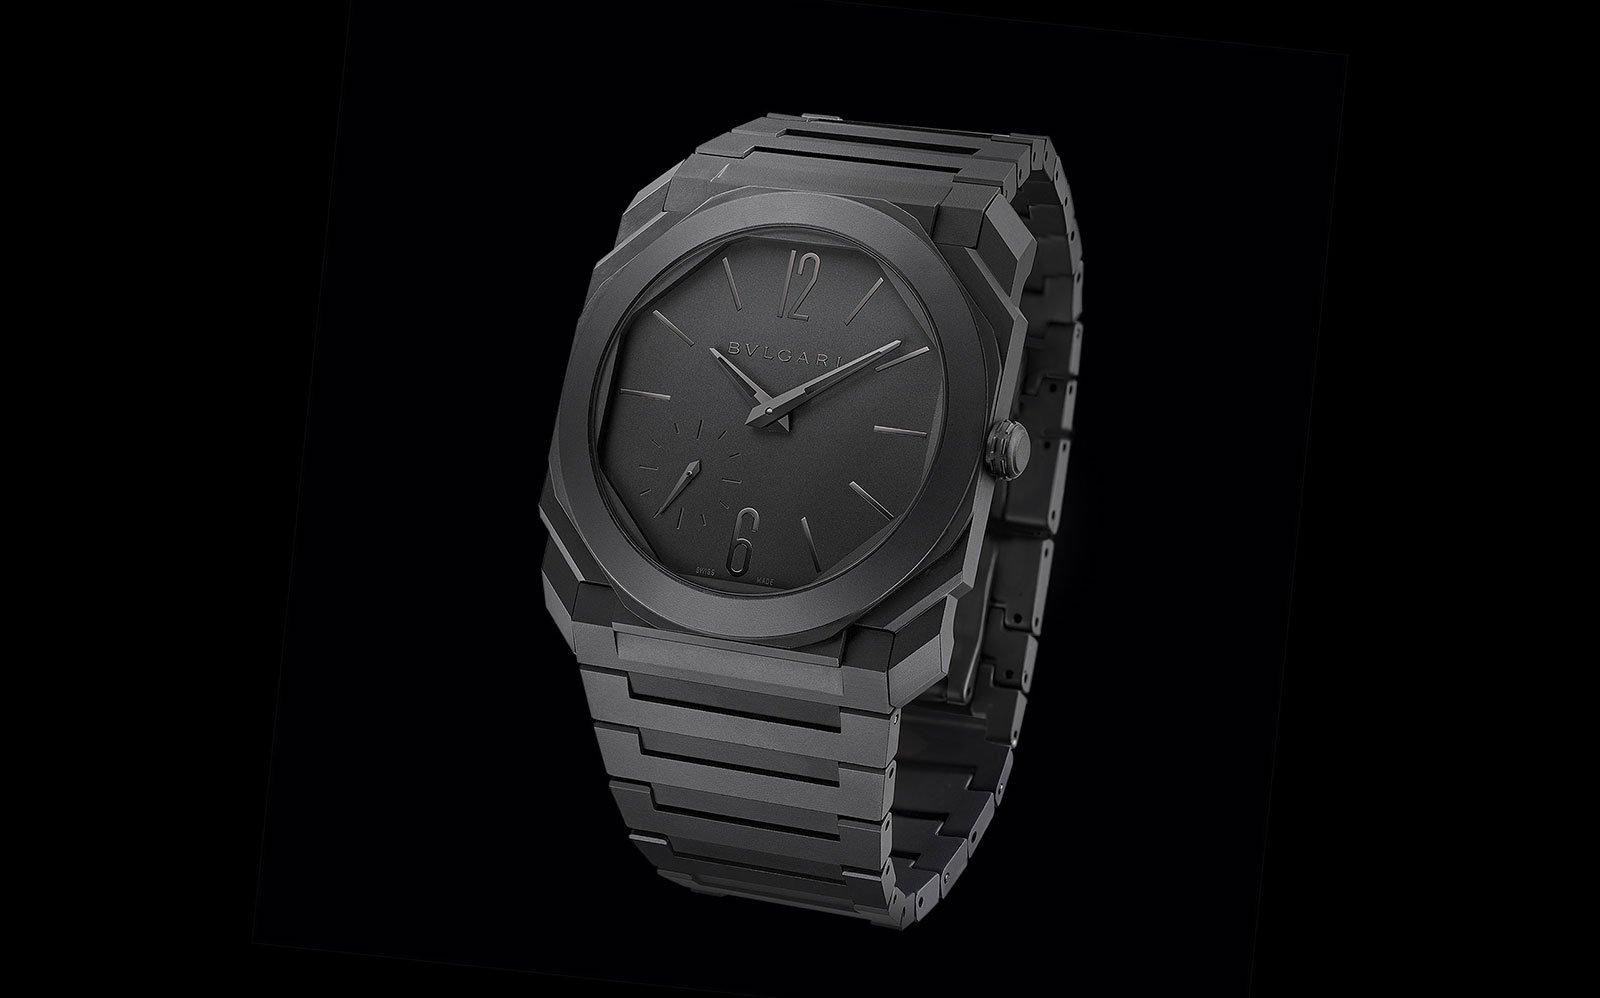 New Luxury Watches LVMH Watch Week Dubai 2020 Bulgari Octo Finissimo Automatic Ceramic